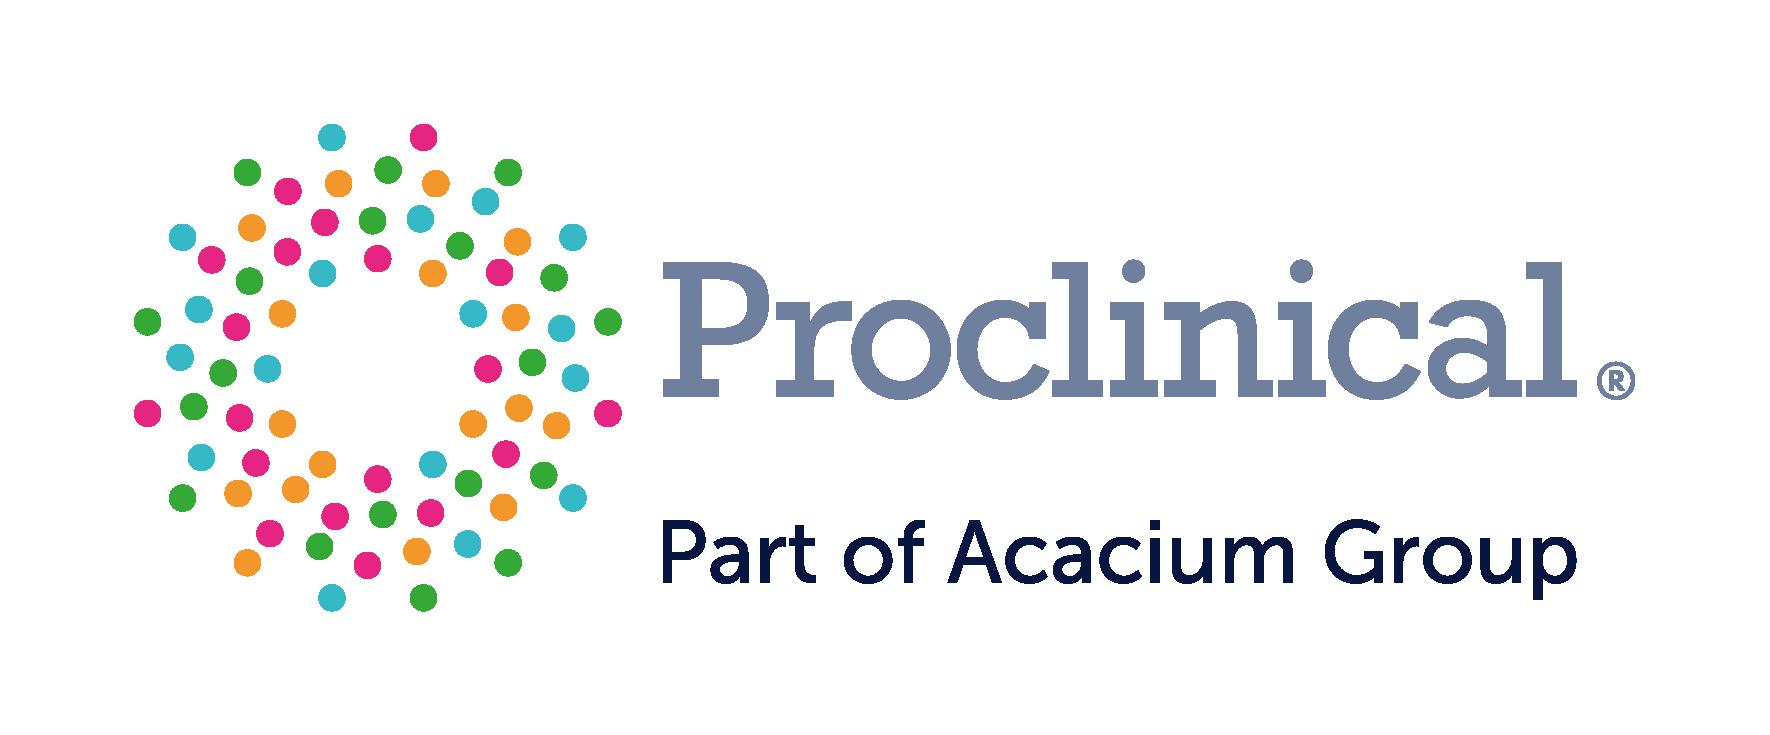 Group - Acacium - Trademark - logo RGB